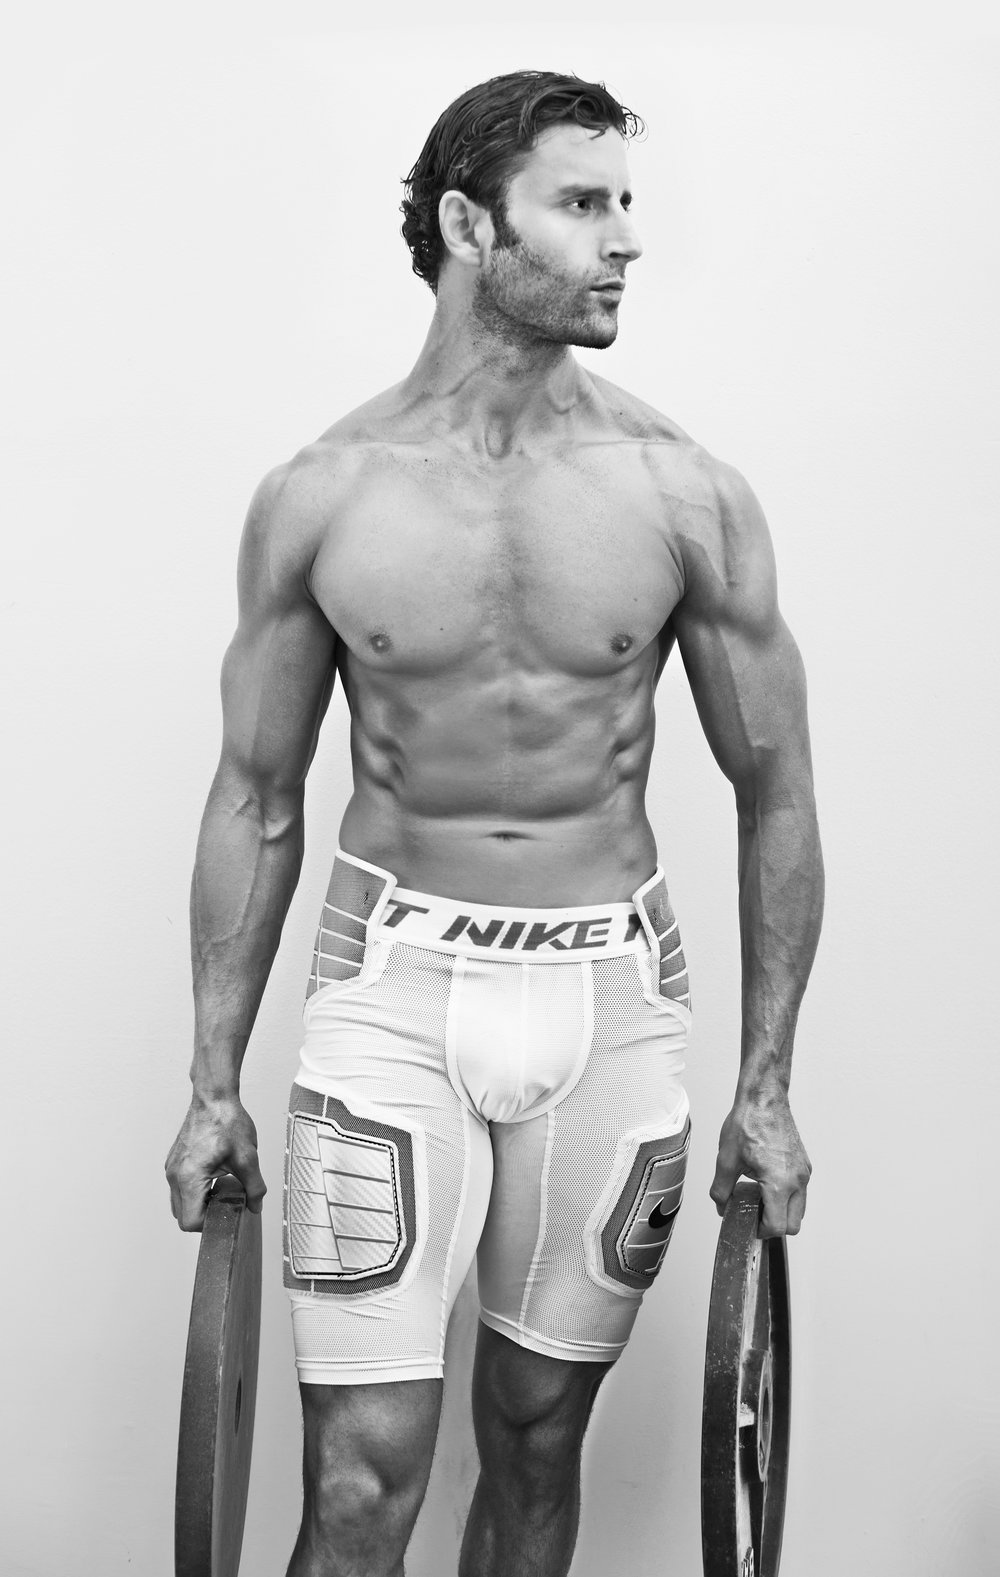 Jacob_Nike_BW_Editorial_Weights_01.jpg